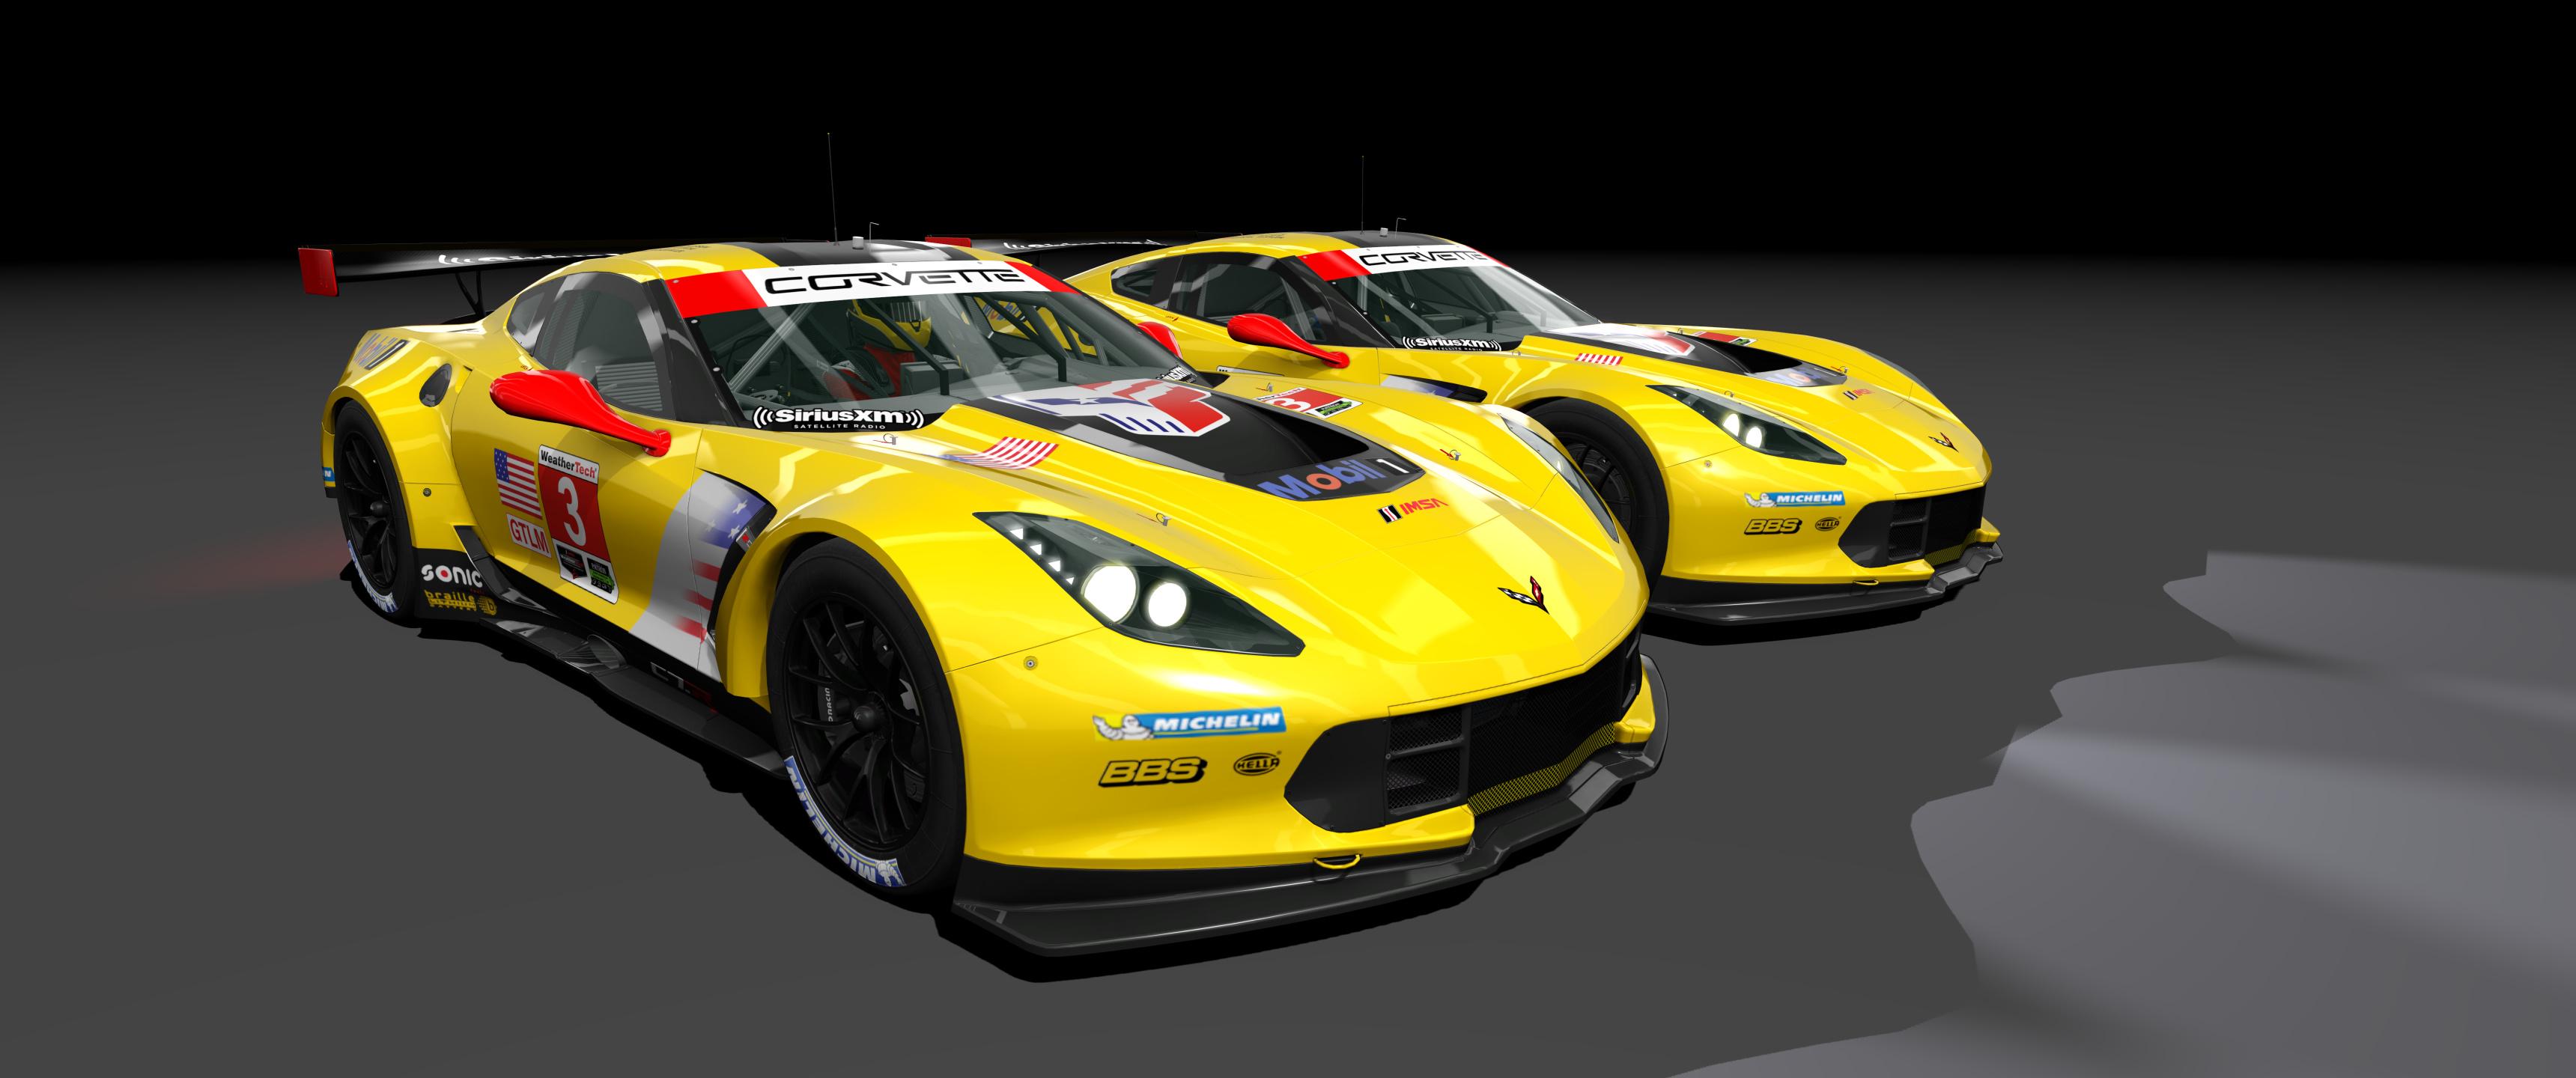 2018 Corvette Racing C7.R